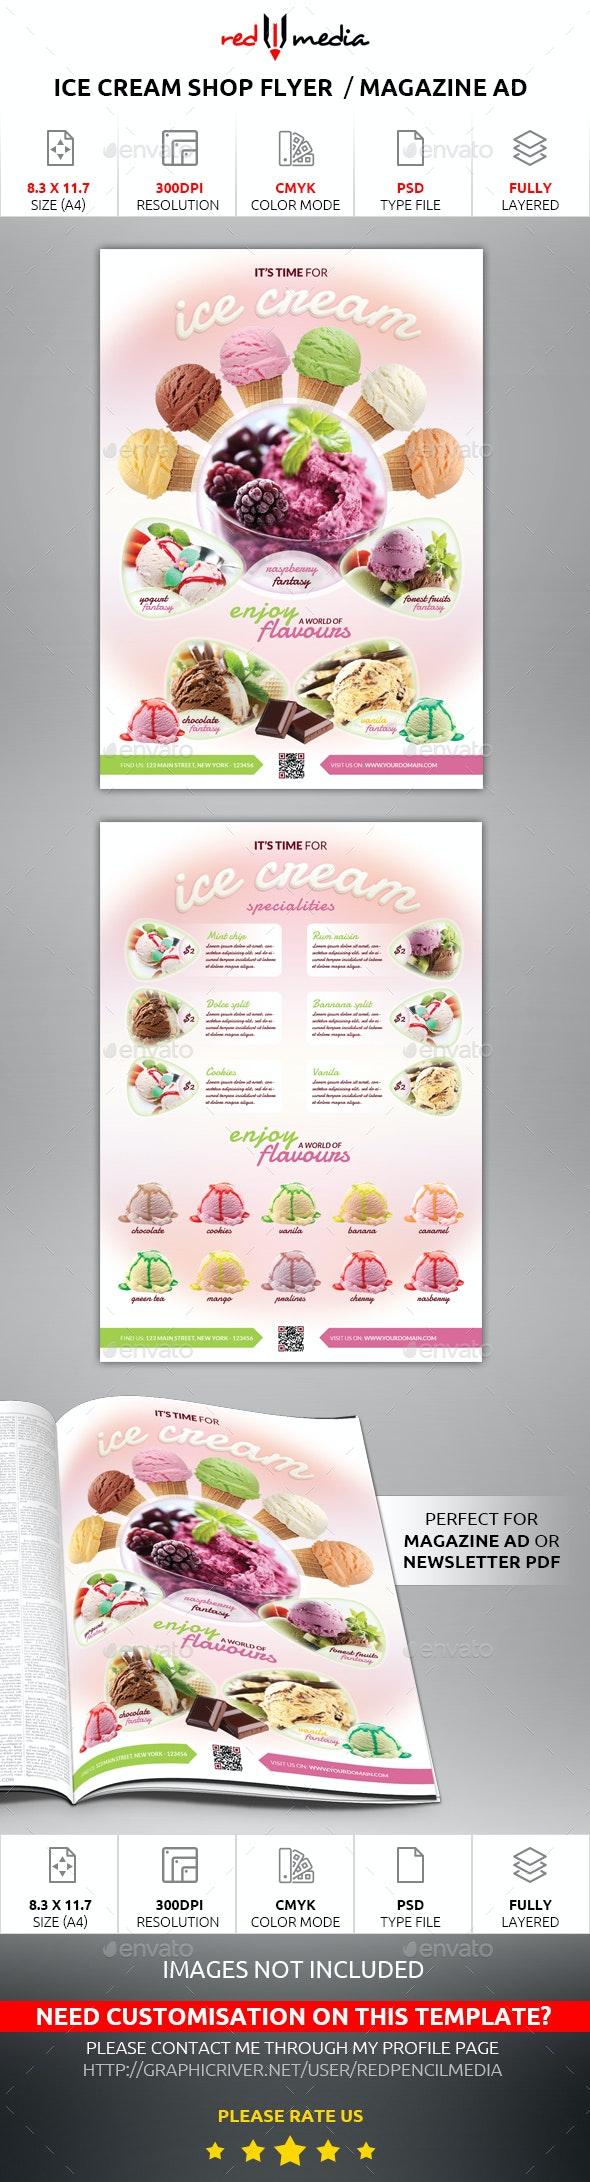 Ice Cream Shop Flyer / Magazine AD - Restaurant Flyers